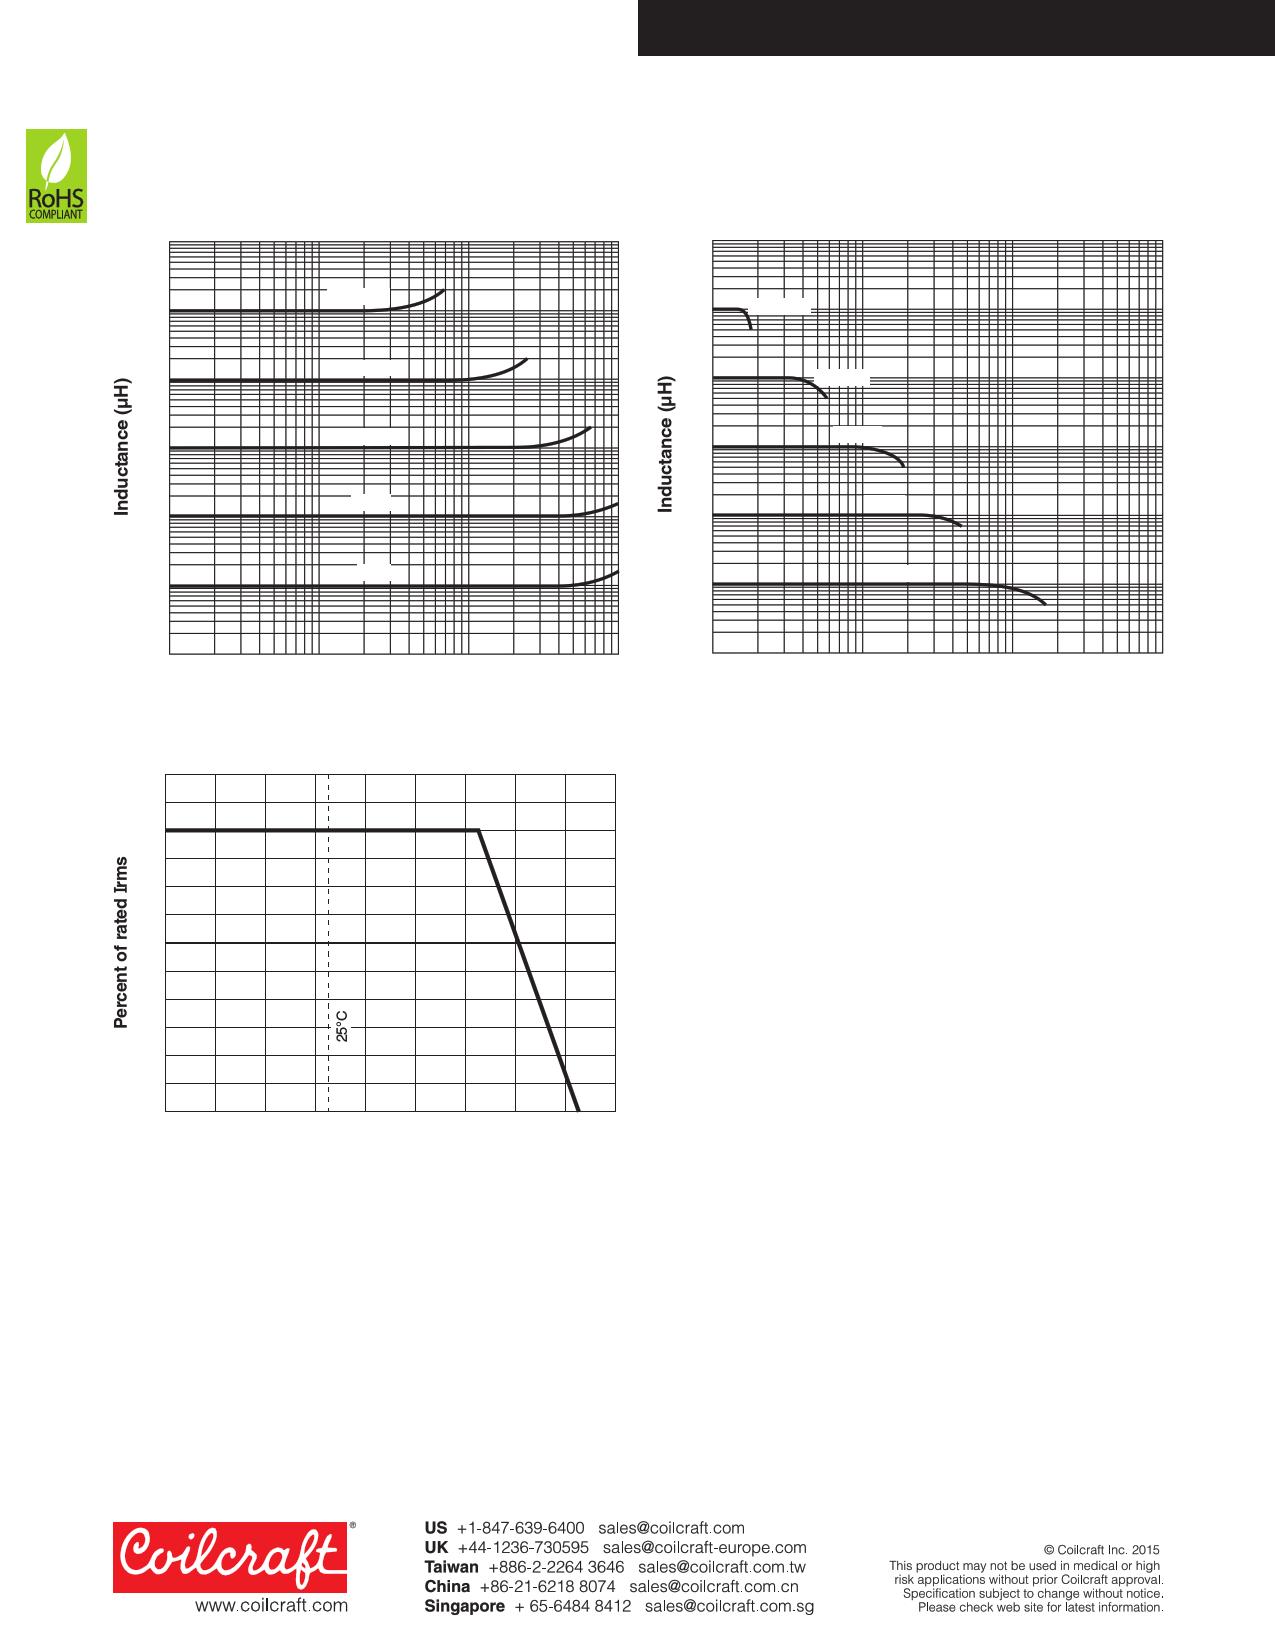 DS1608C-822JLD pdf, ピン配列